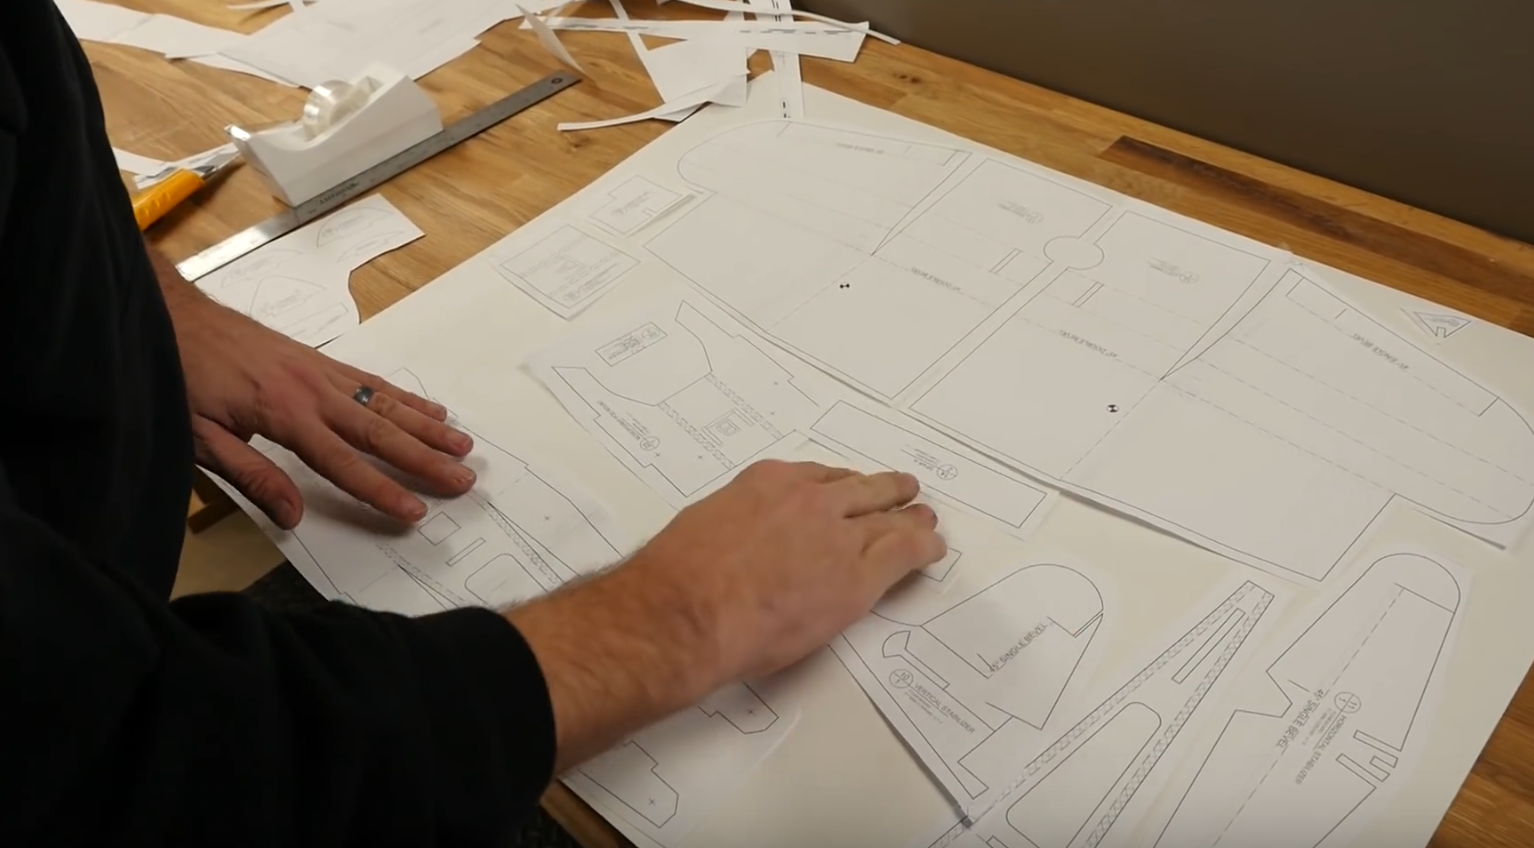 Step-By-Step RC Airplane Design | Flite Test